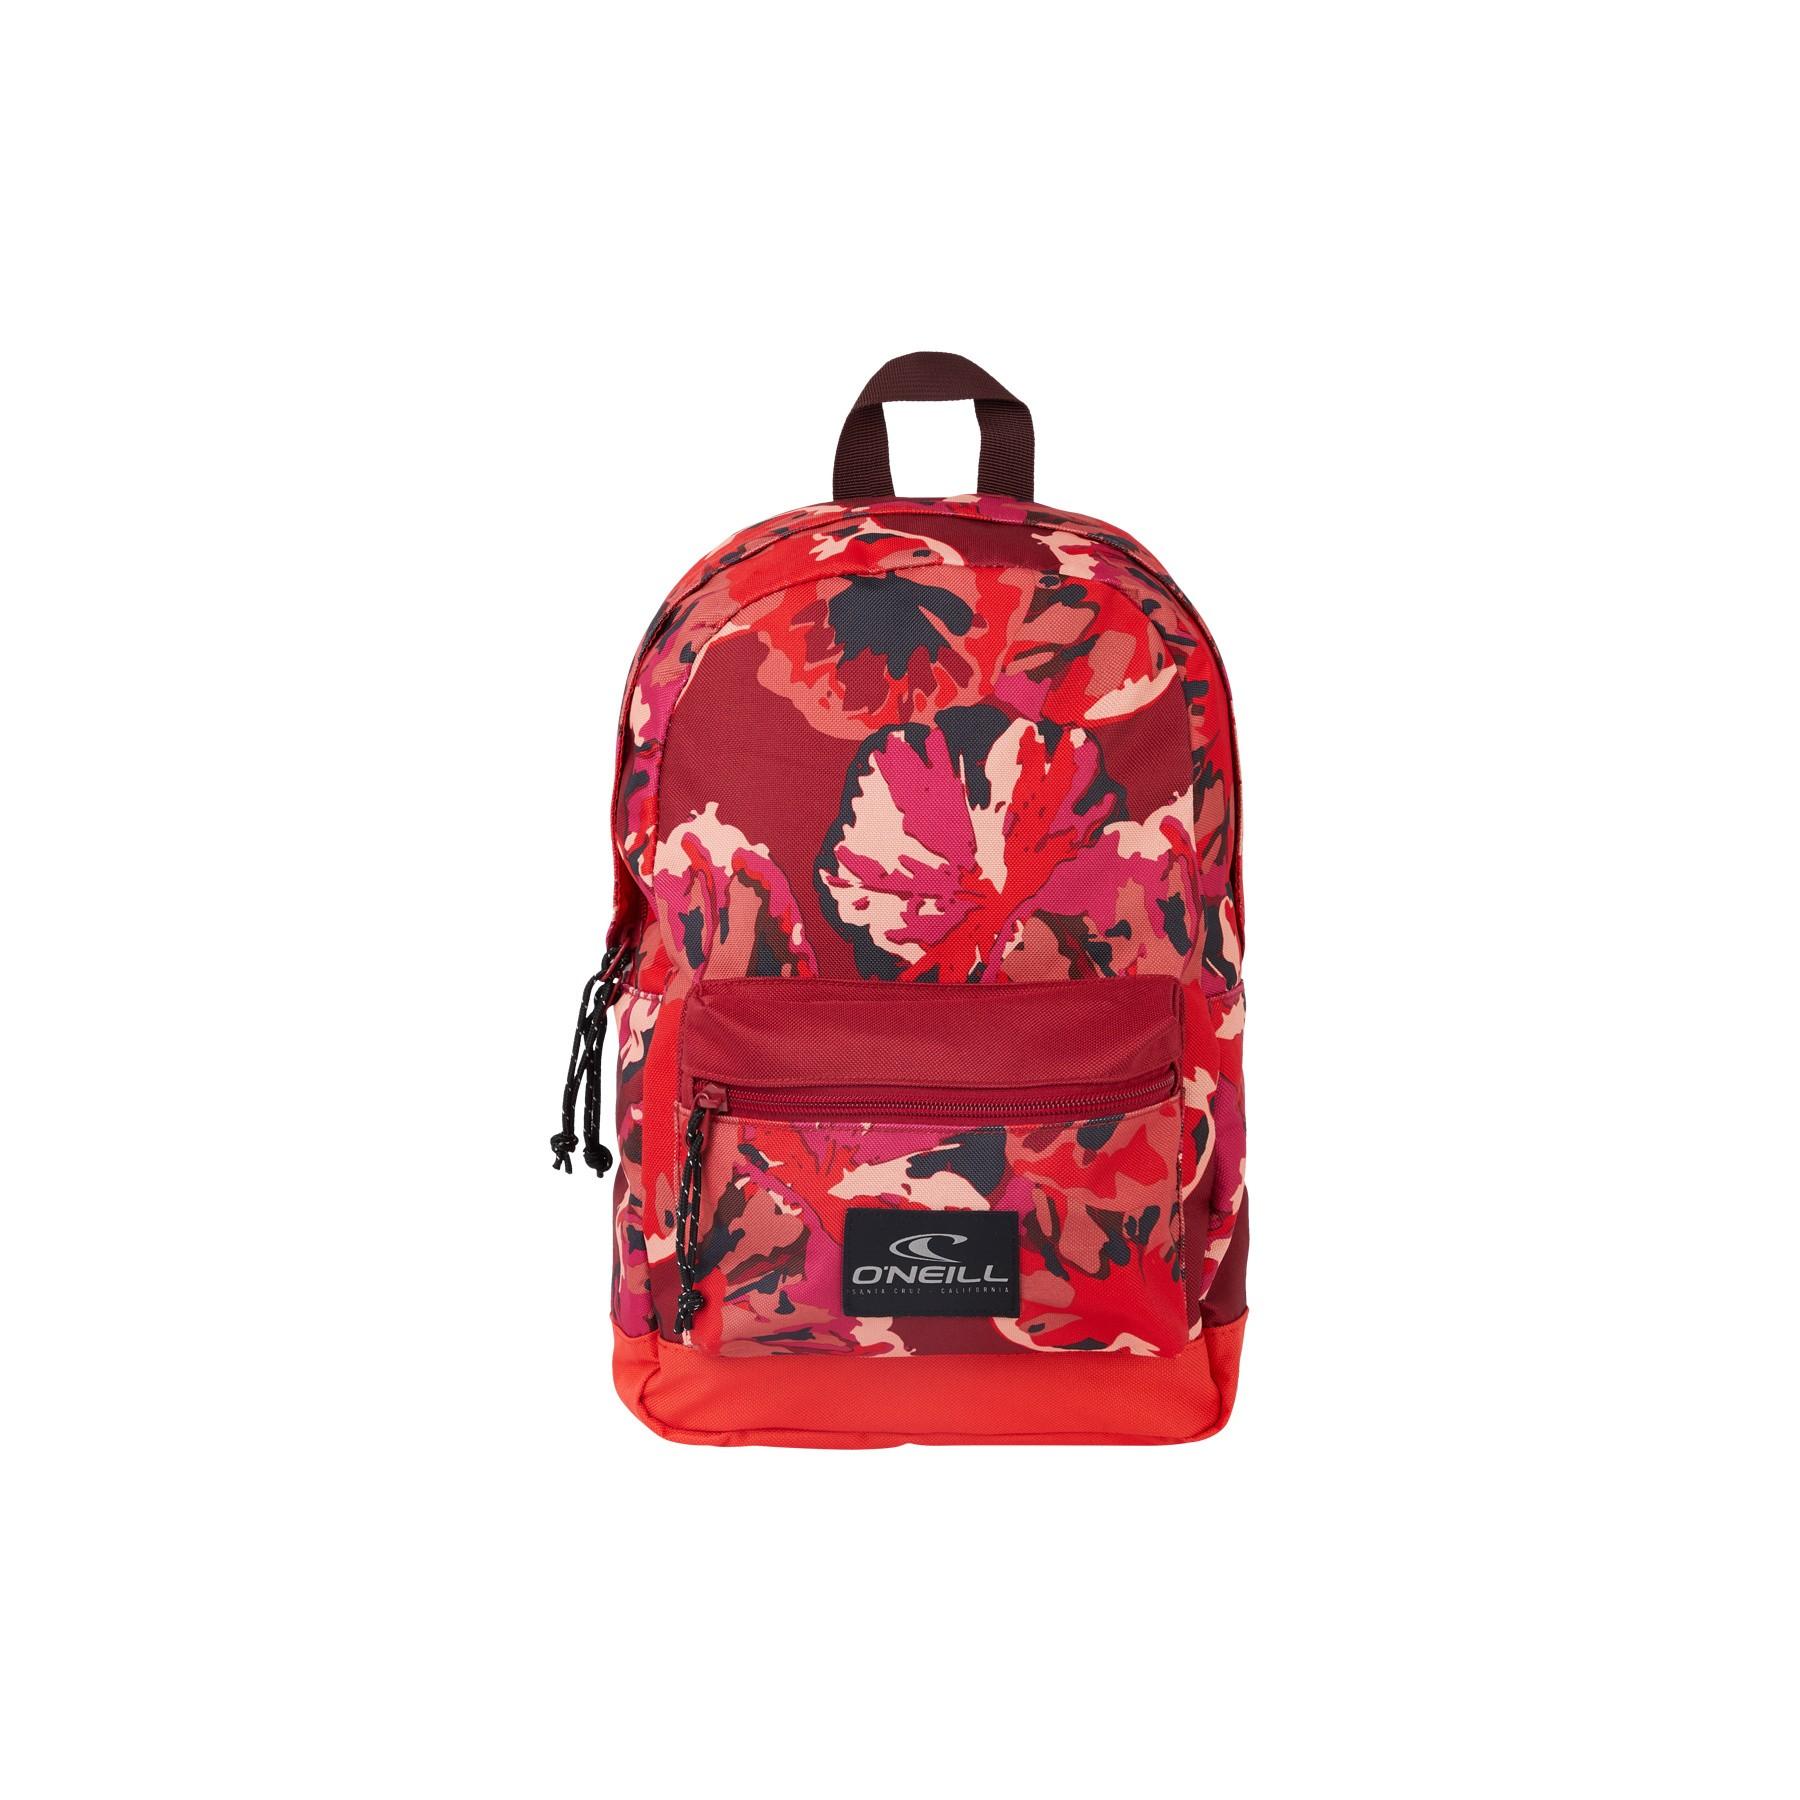 O'Neill Coastline Mini Backpack 3940 Red AOP